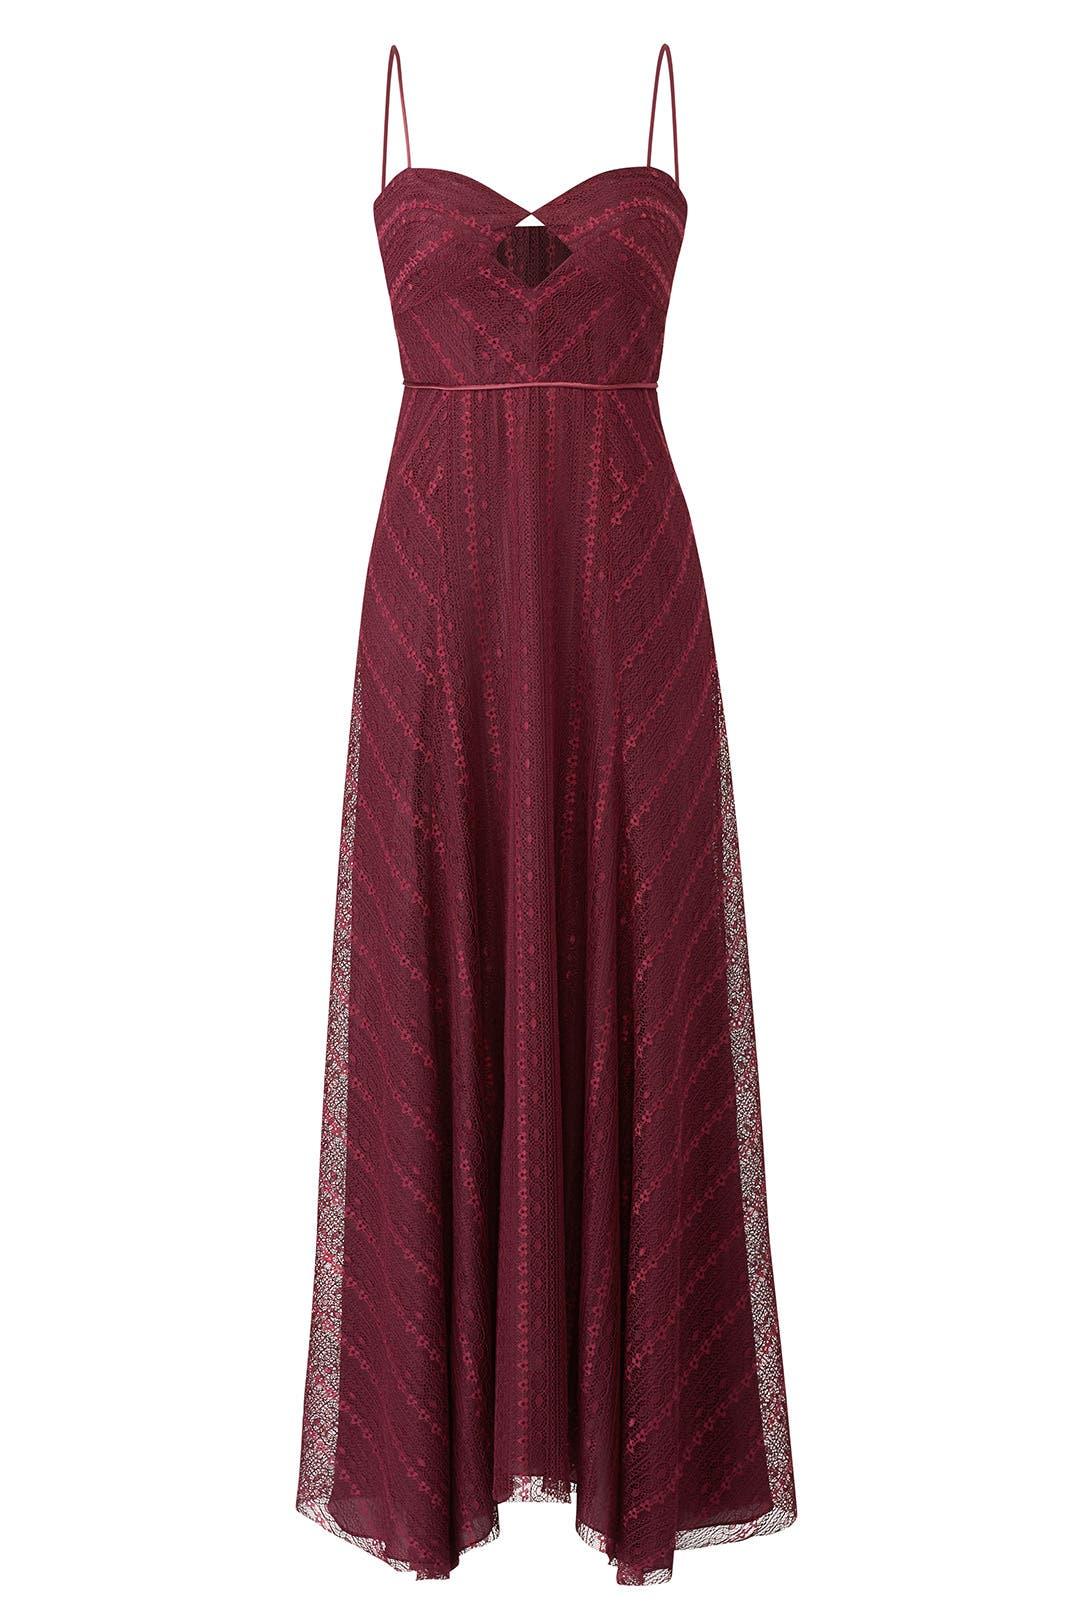 Eliza Lace Slip Gown by Jill Jill Stuart for $50 - $70   Rent the Runway